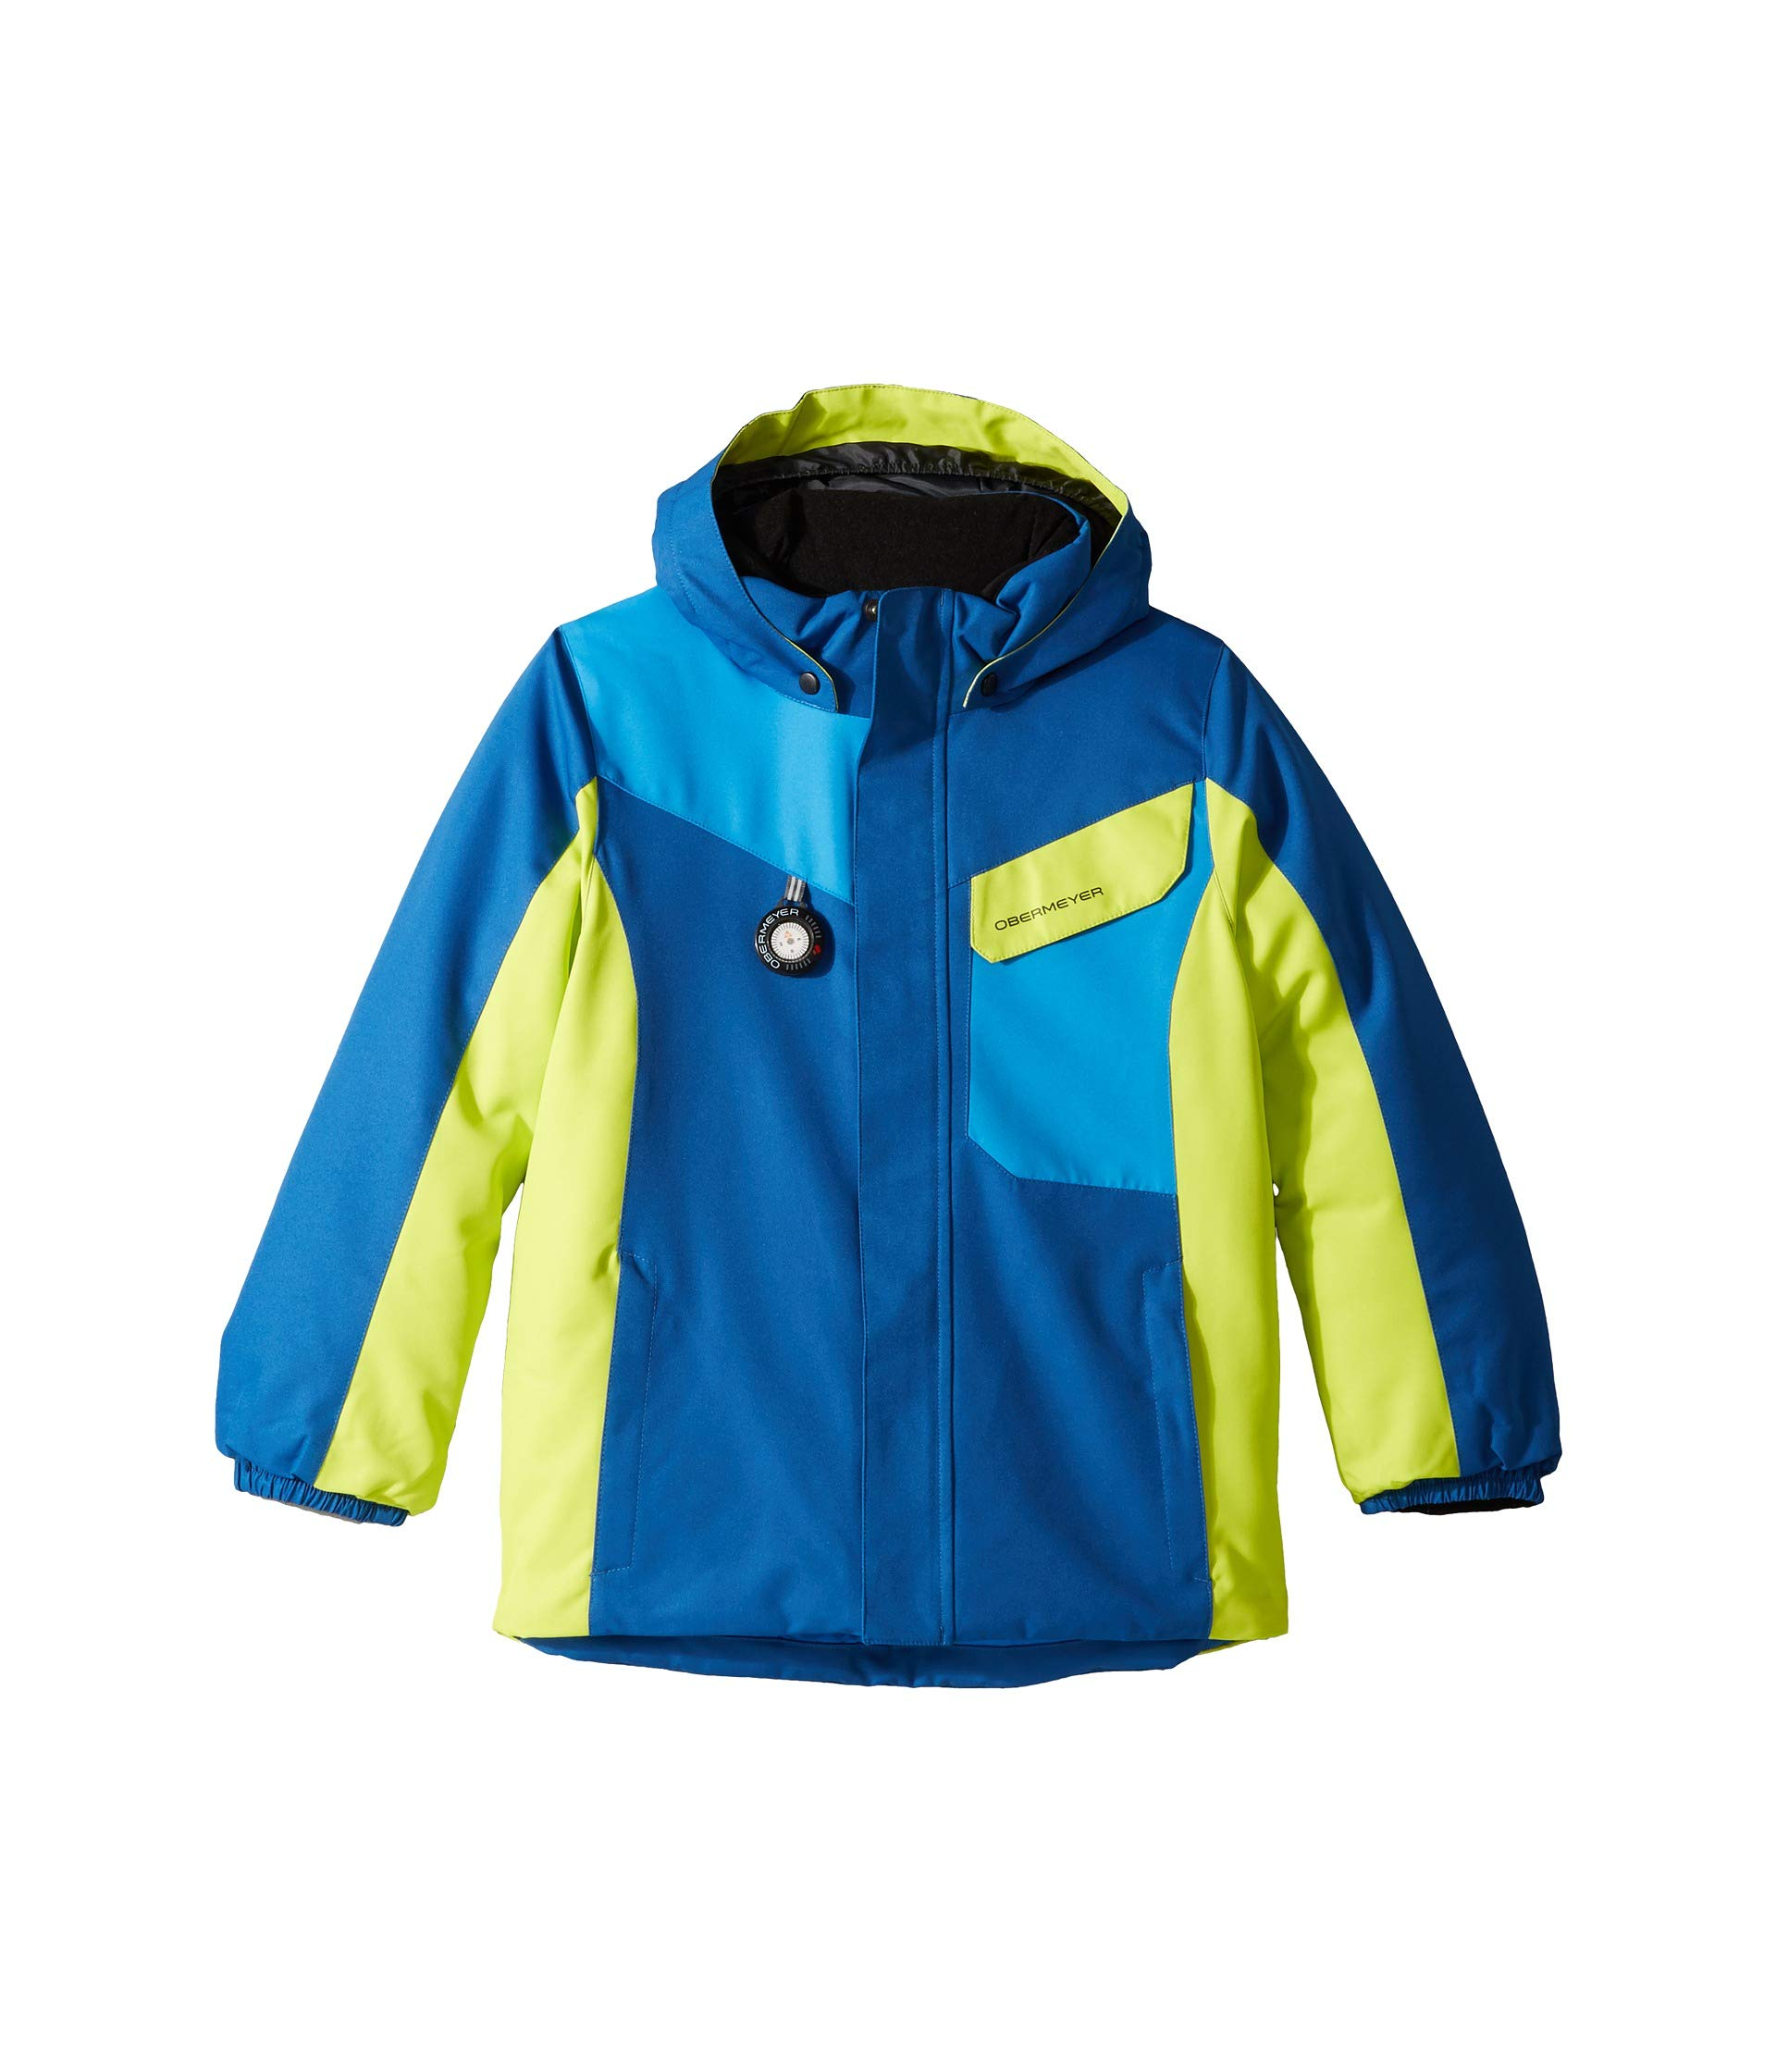 Obermeyer Kids Baby Boy's Galactic Jacket (Toddler/Little Kids/Big Kids) Captain Blue 3T